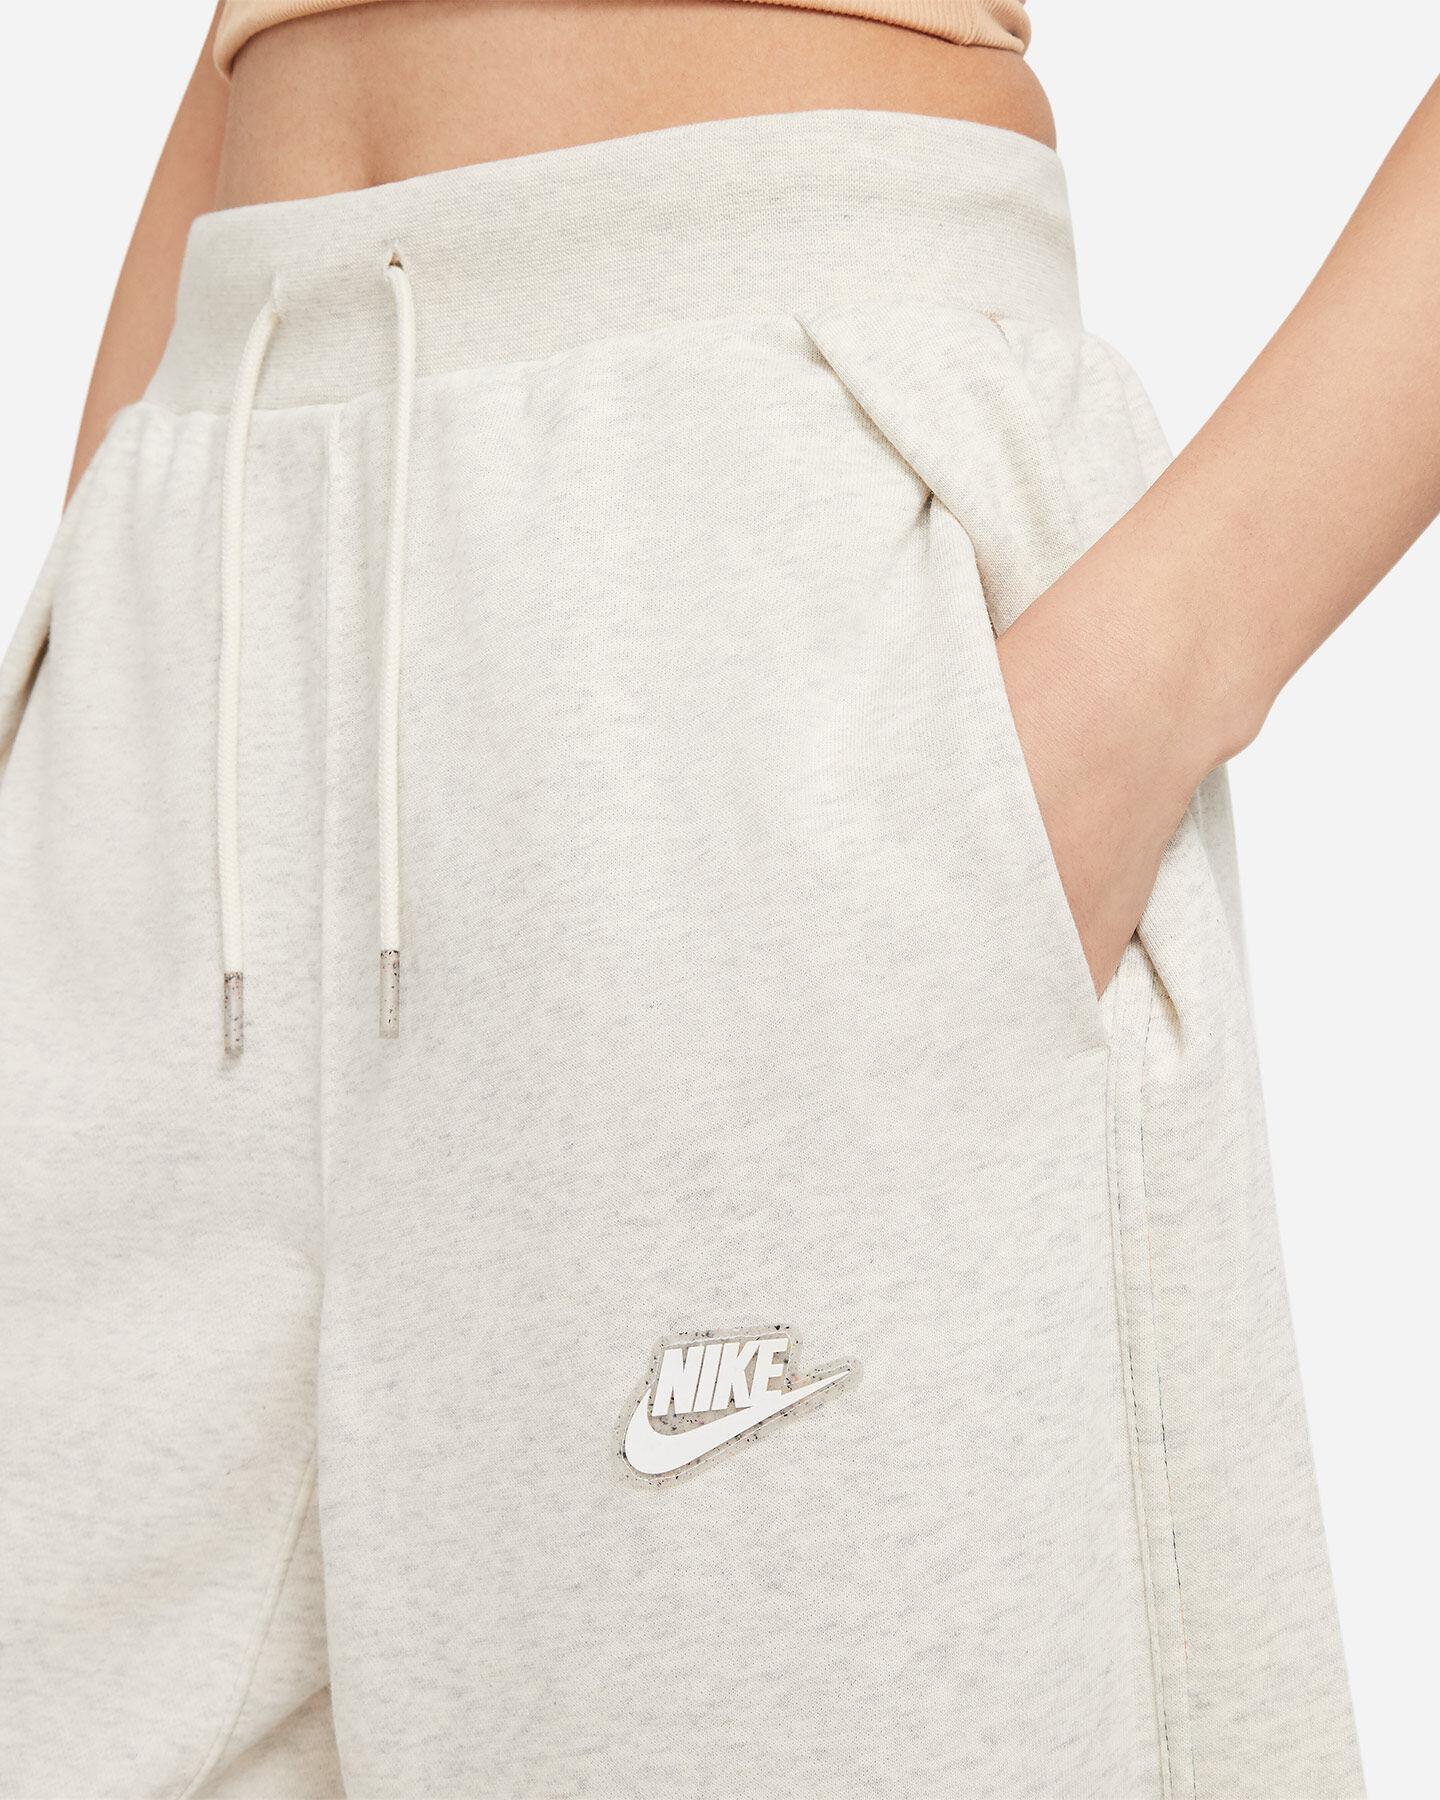 Pantalone NIKE EARTH DAY W S5269771 scatto 2